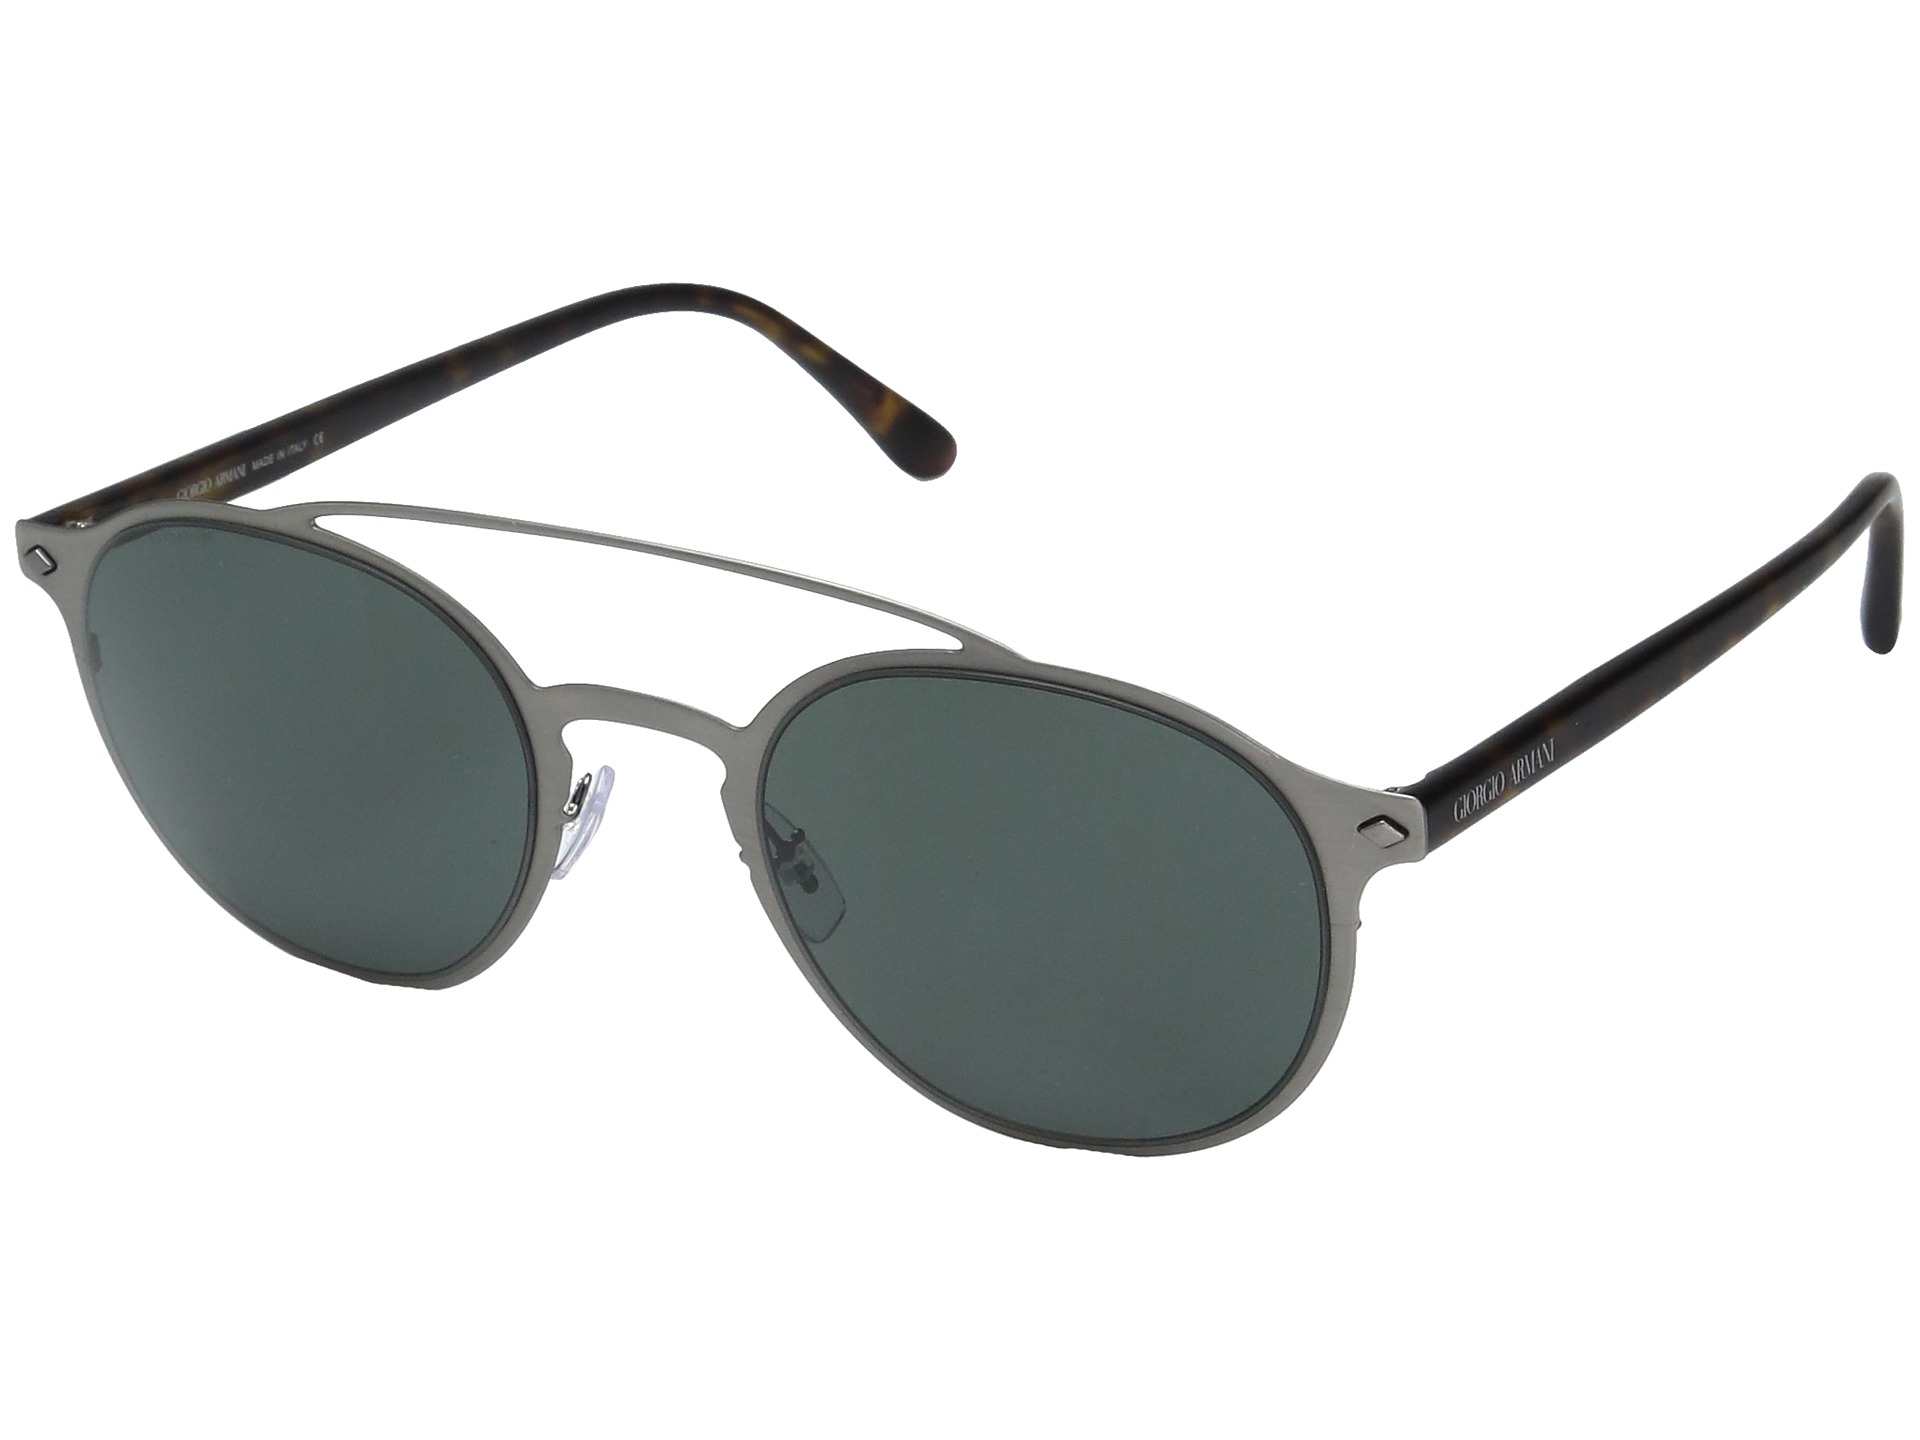 Armani Glasses Frames Australia : Giorgio Armani 0AR6041 at Zappos.com